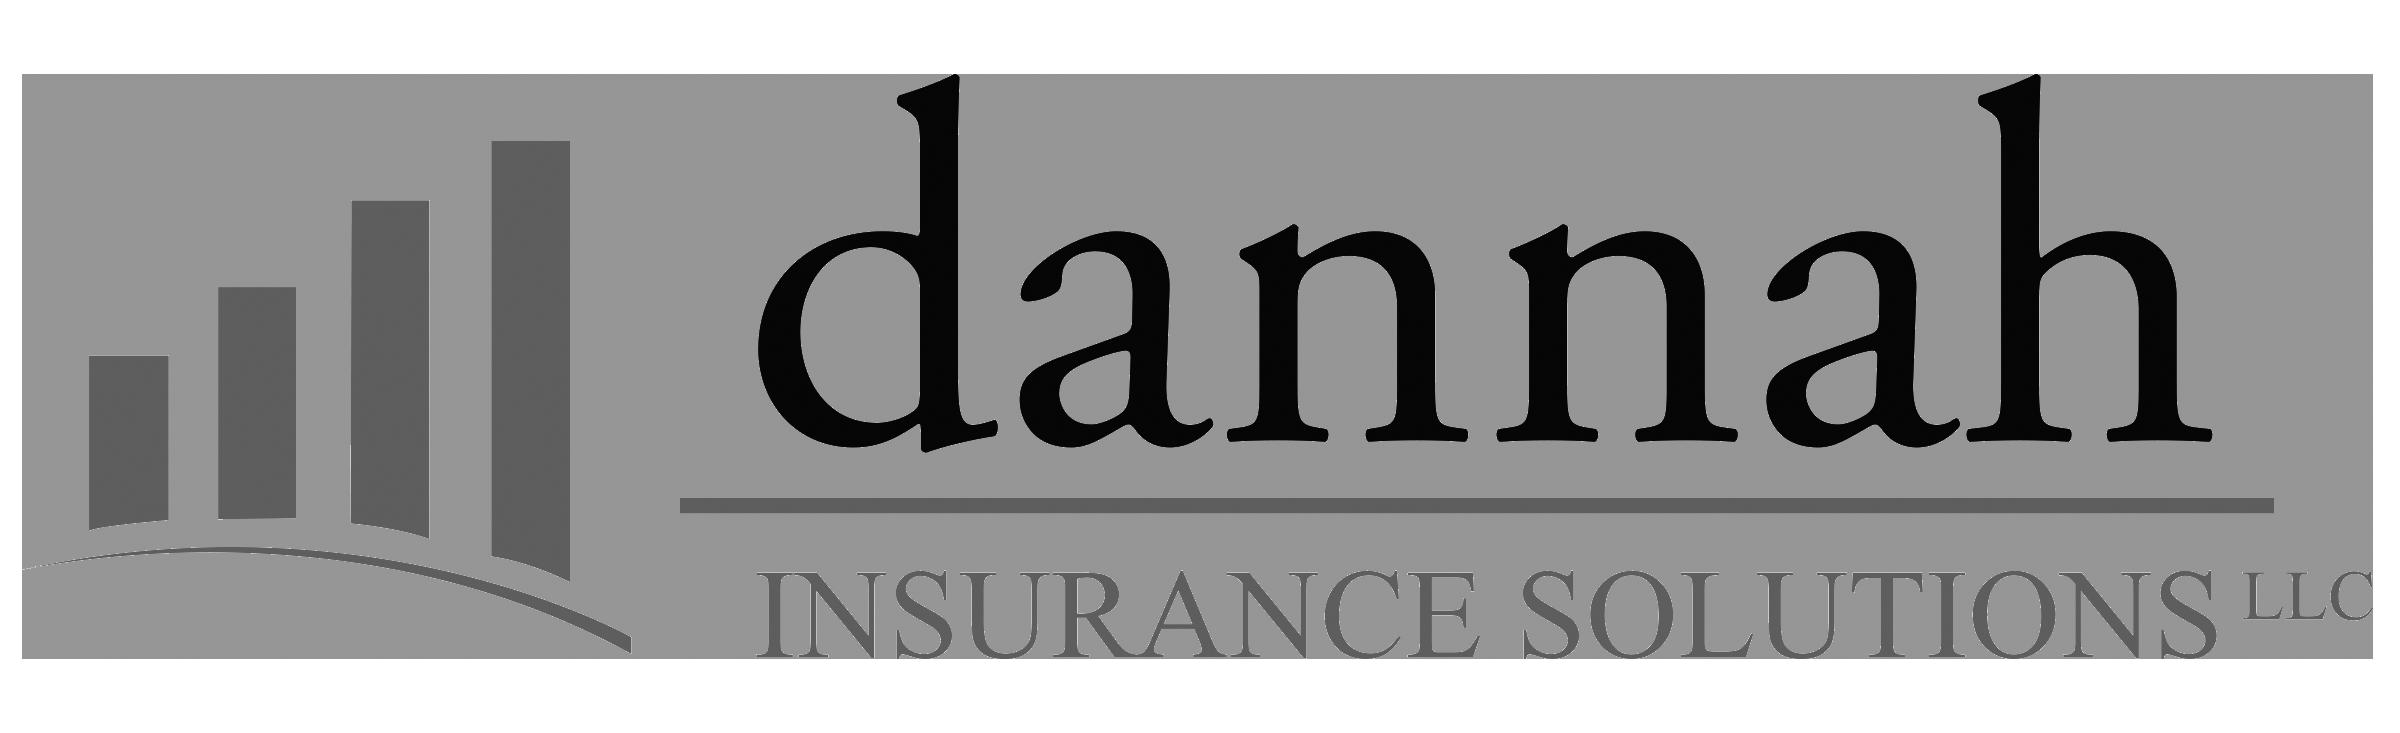 Dannah-Insurance-Solutions-Logo-grey.png